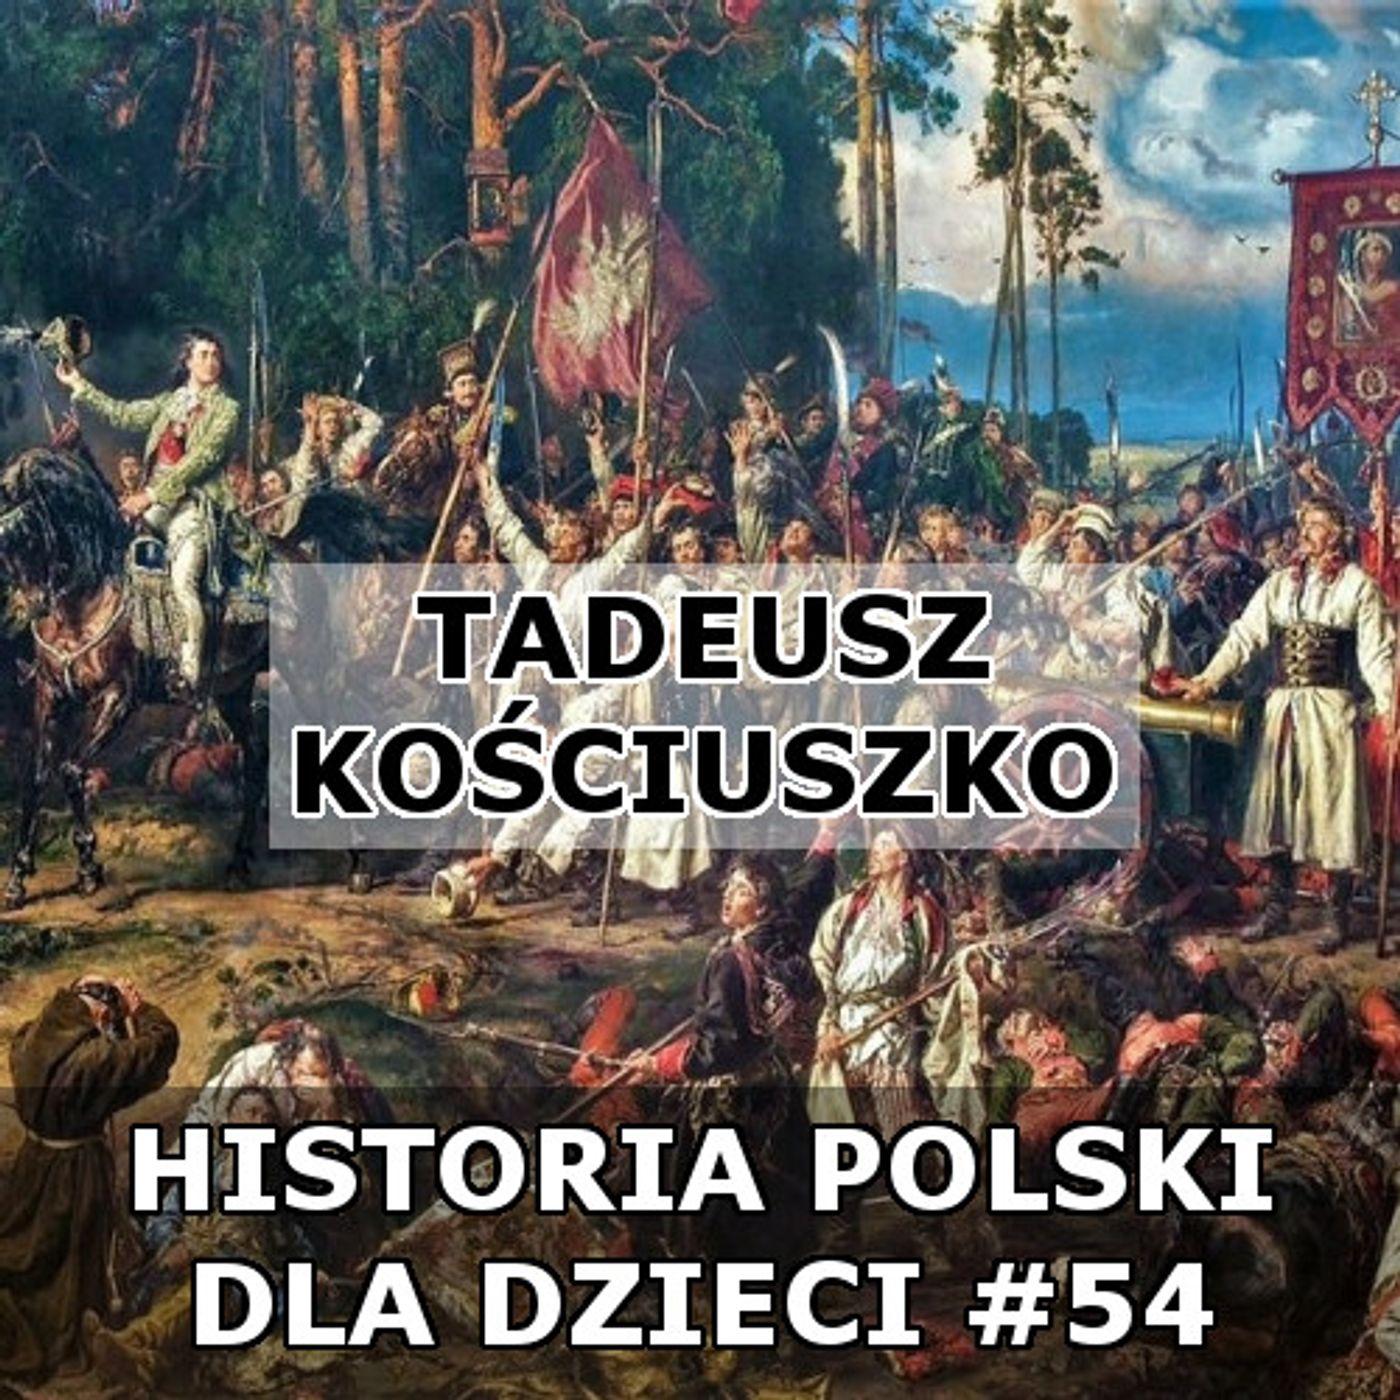 54 - Tadeusz Kościuszko